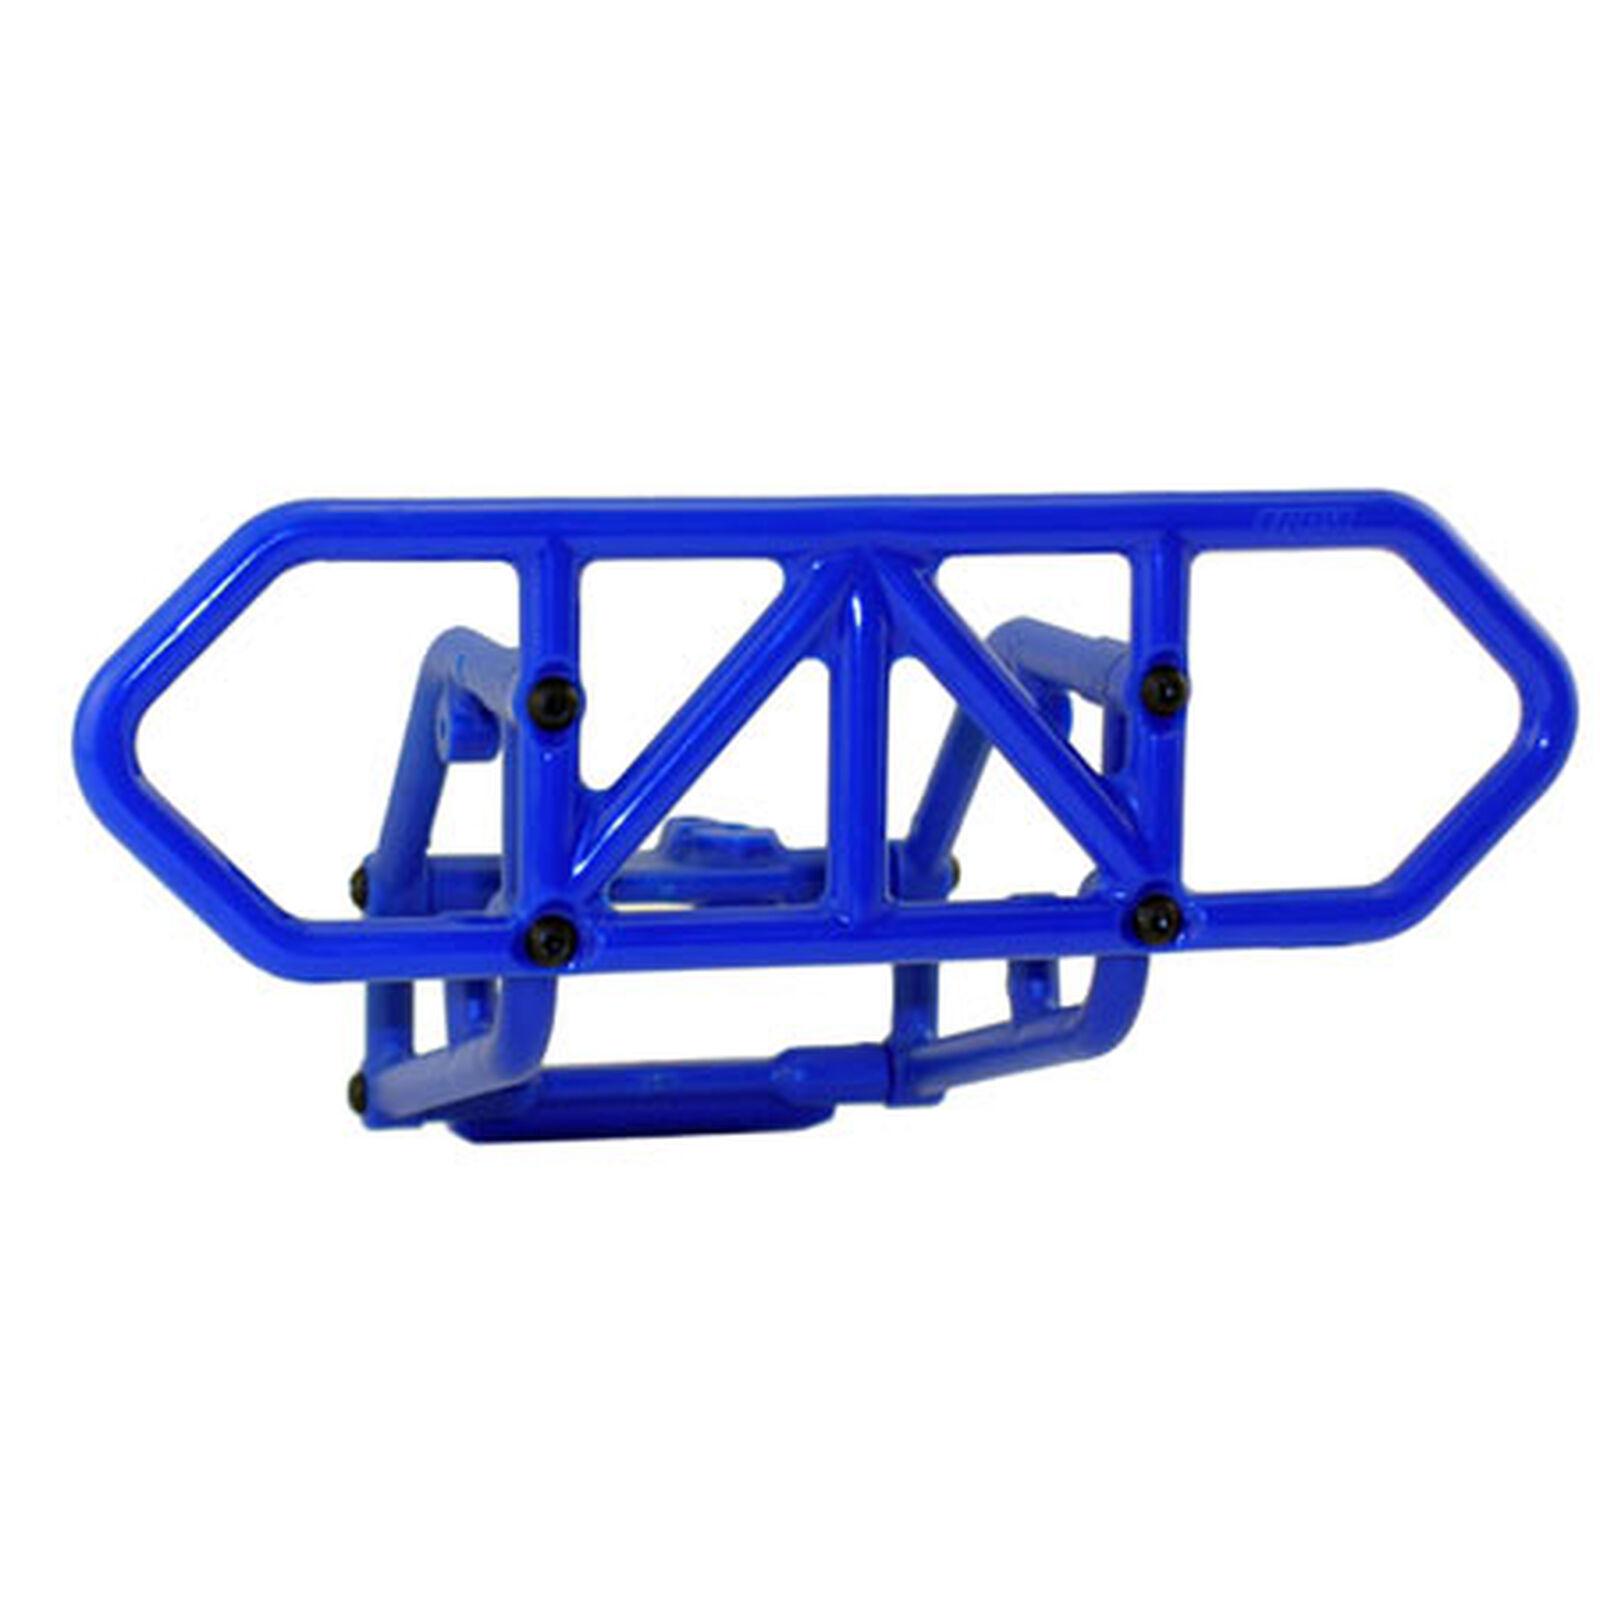 Rear Bumper, Blue: SLH 4x4